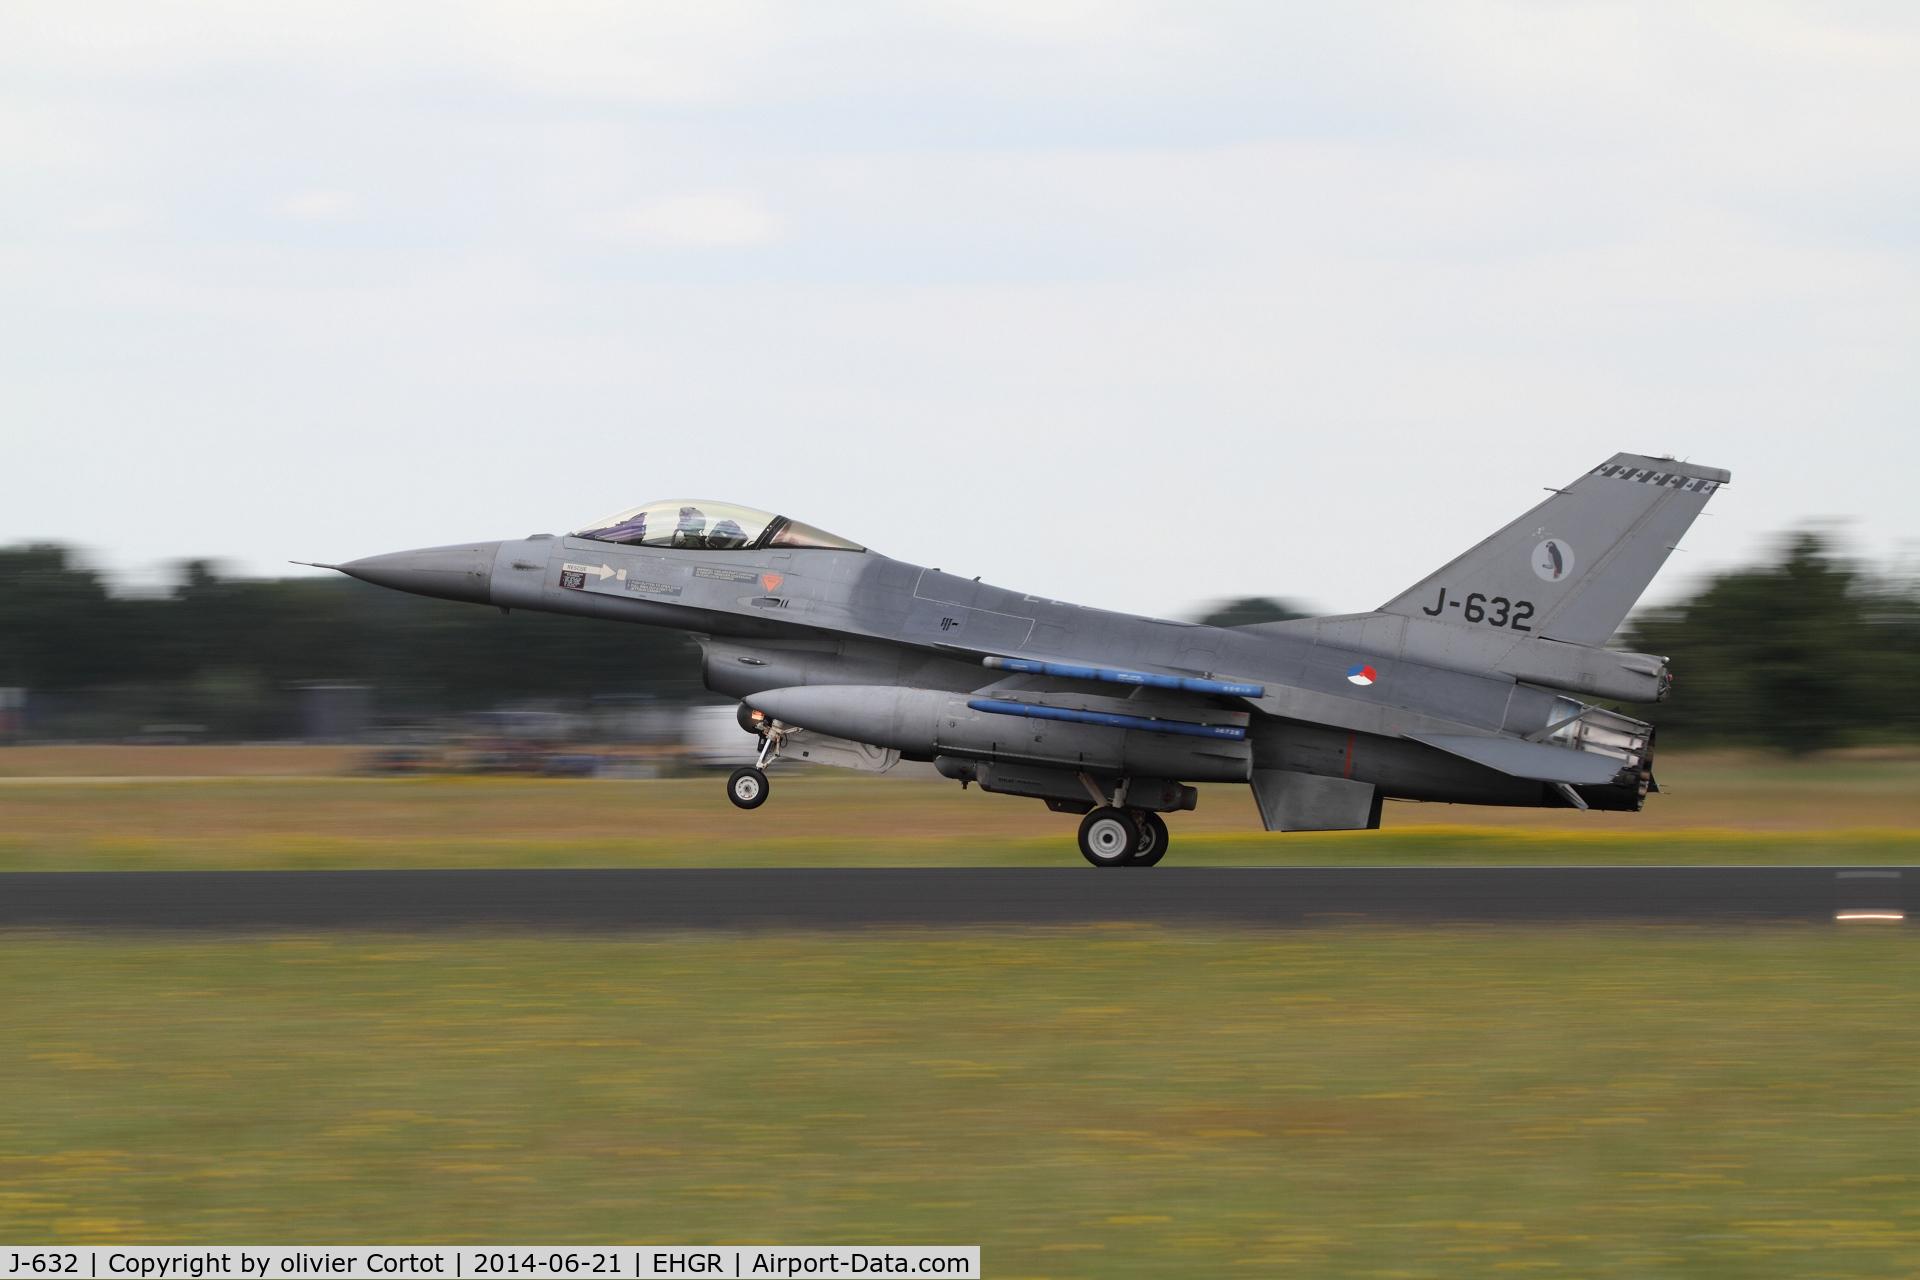 J-632, General Dynamics F-16A Fighting Falcon C/N 6D-64, 2014 airshow, landing